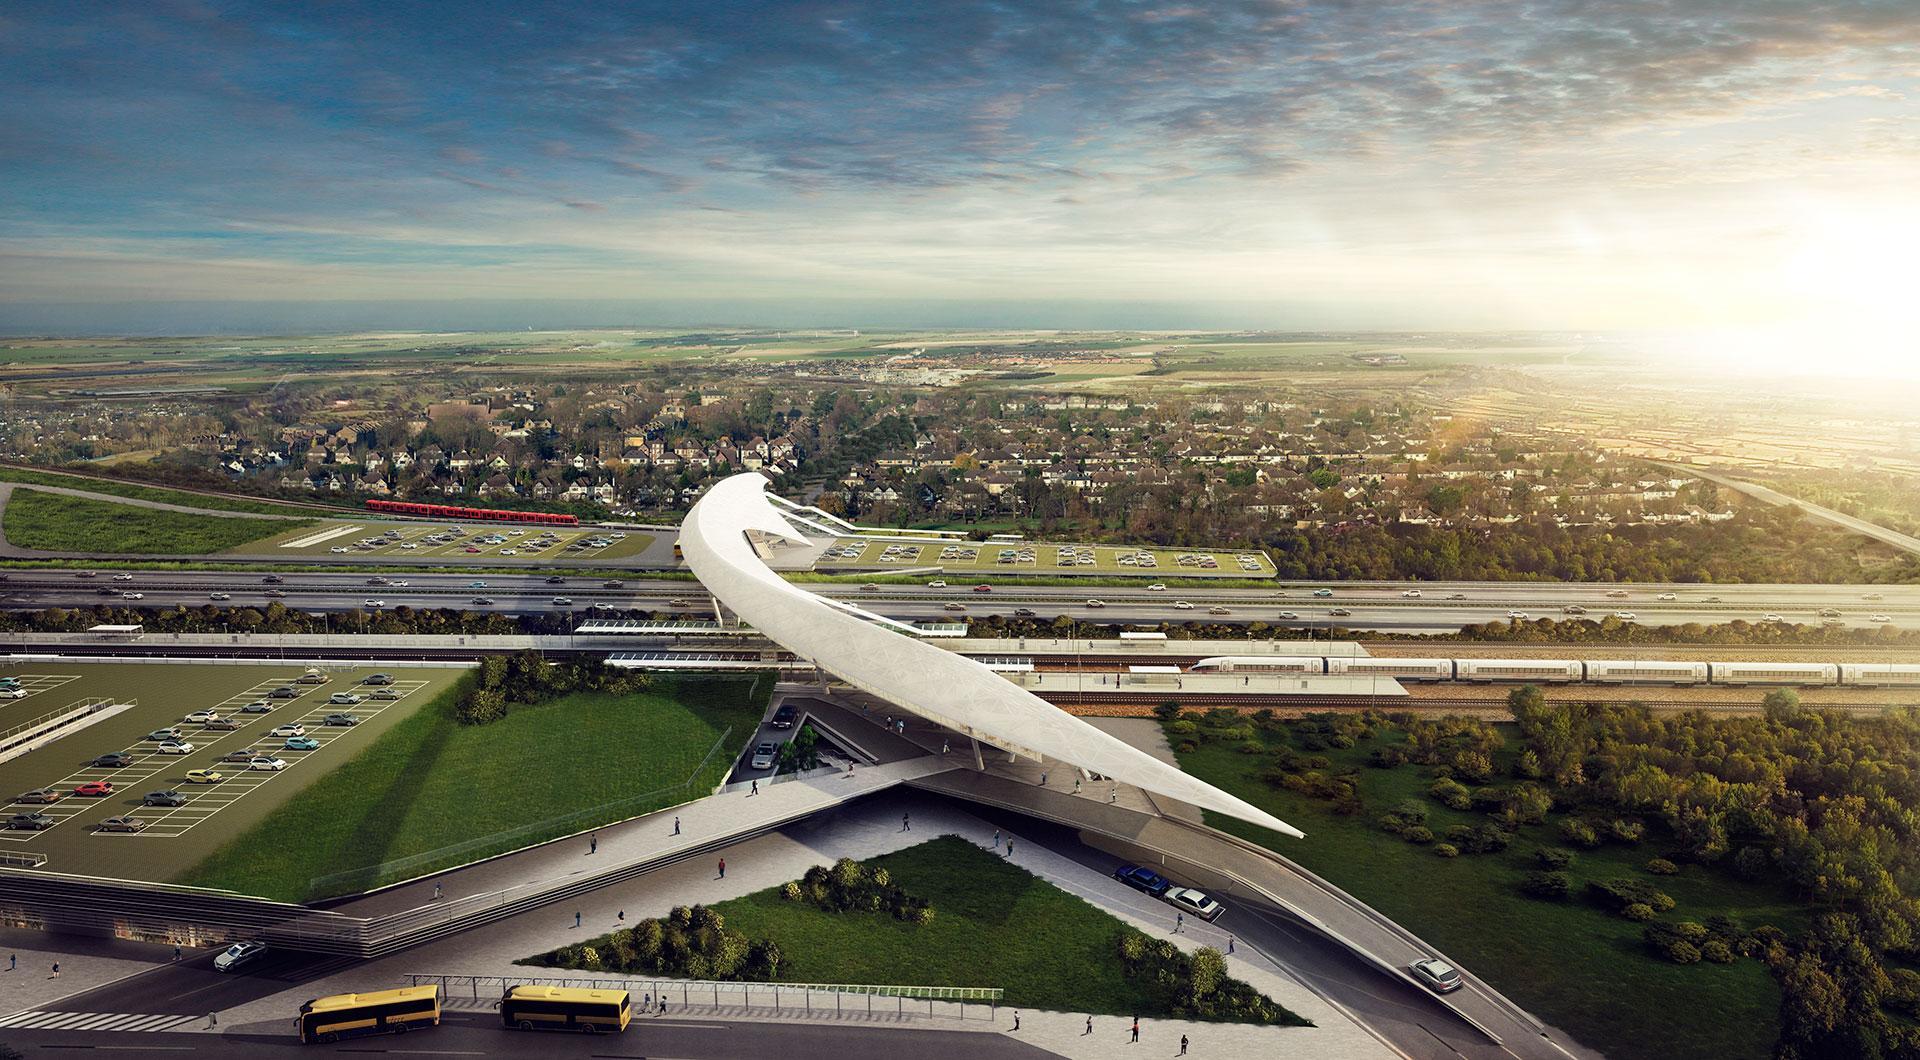 Obliquo Design, render for Køge train station, Kengo Kuma project